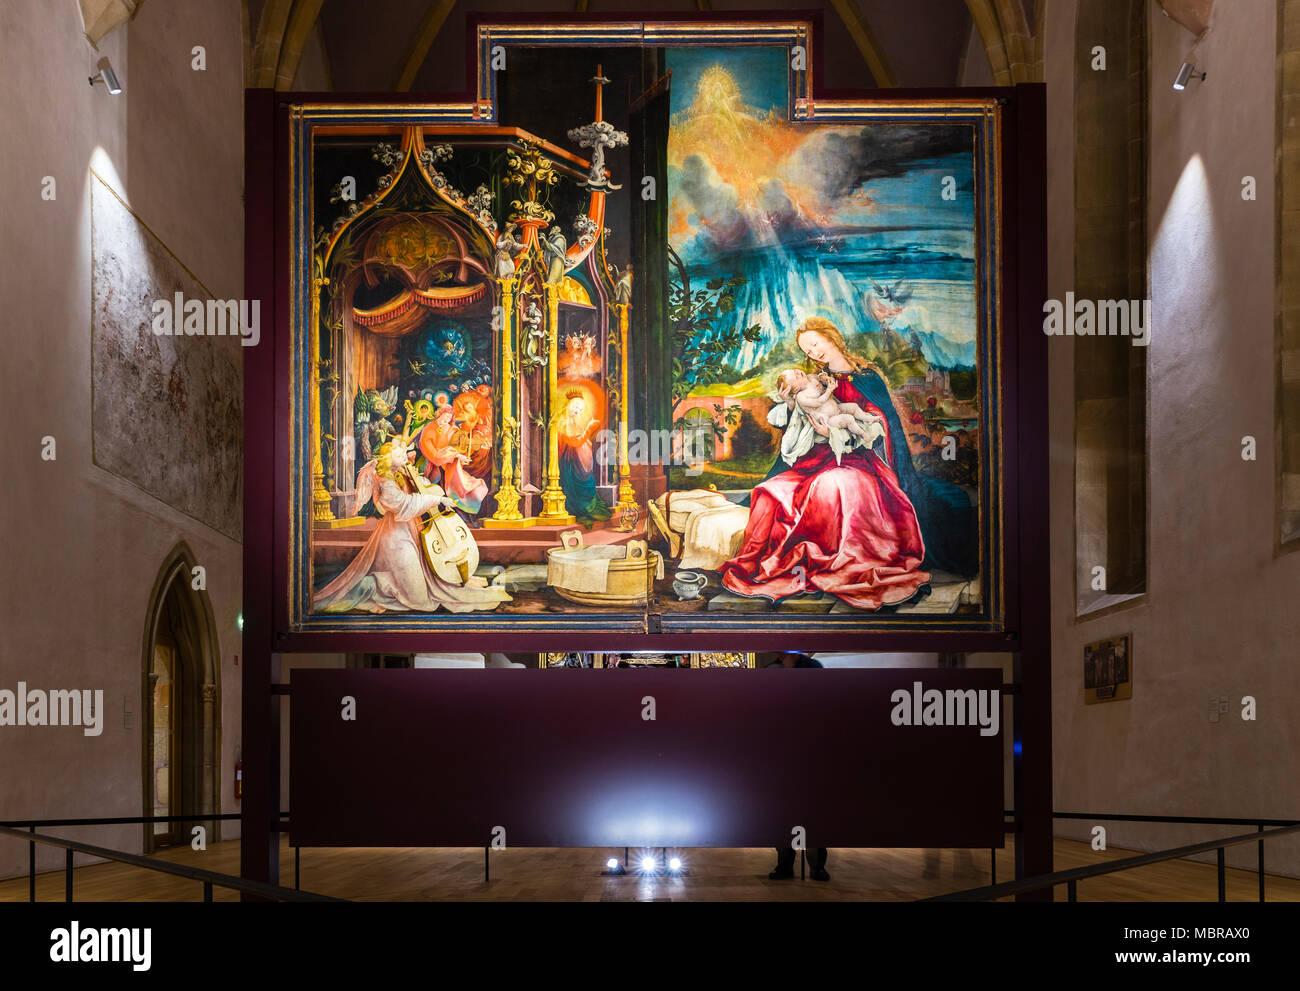 Isenheim Altar by Matthias Grünewald, Painting Angel Concert and the Incarnation of Christ, Museum Unterlinden - Stock Image